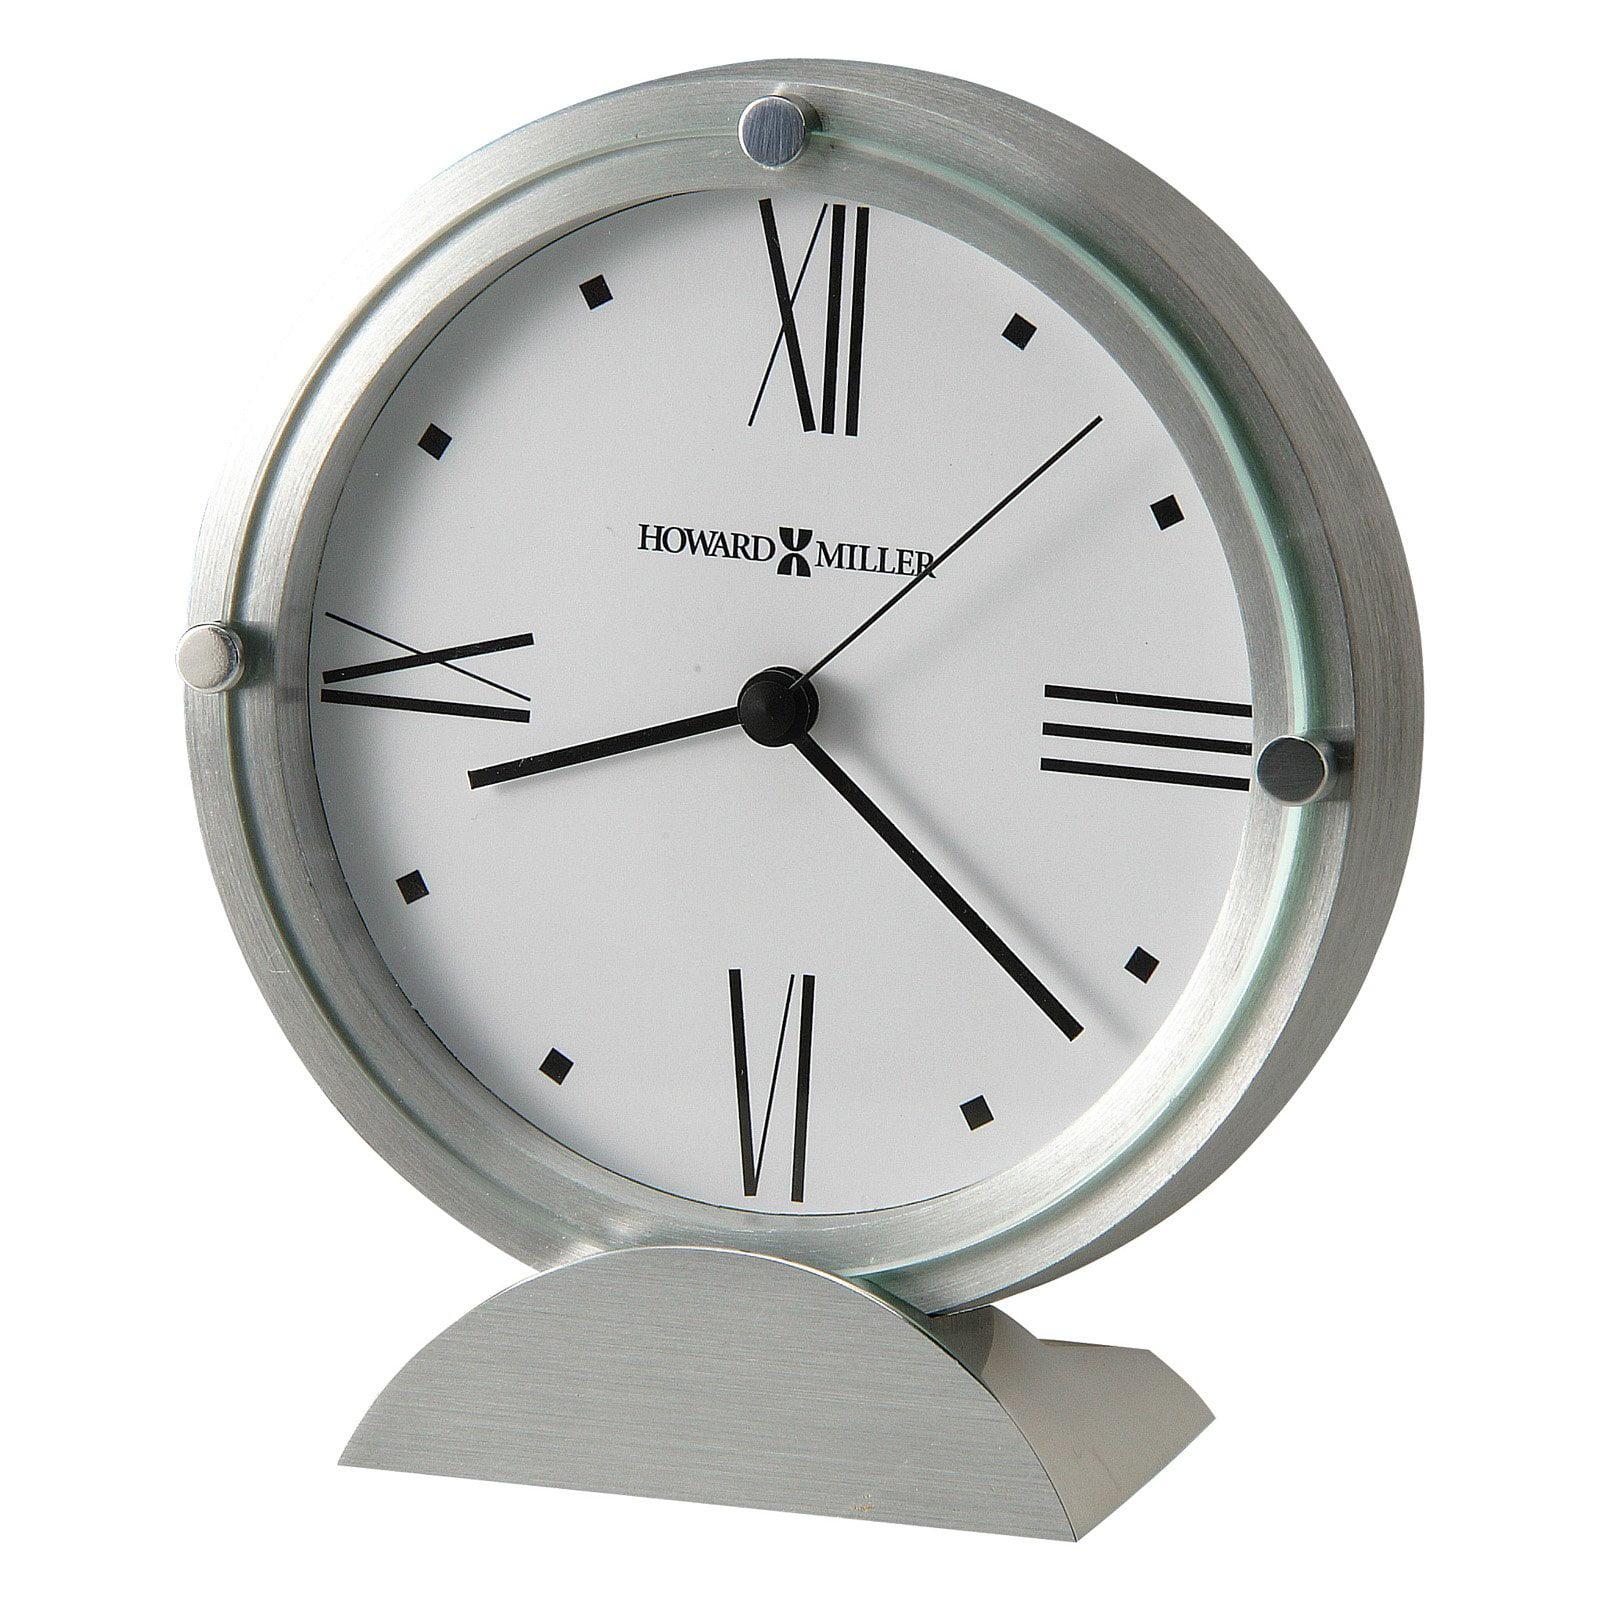 Howard Miller 645-671 Simon II Desktop Clock by Howard Miller